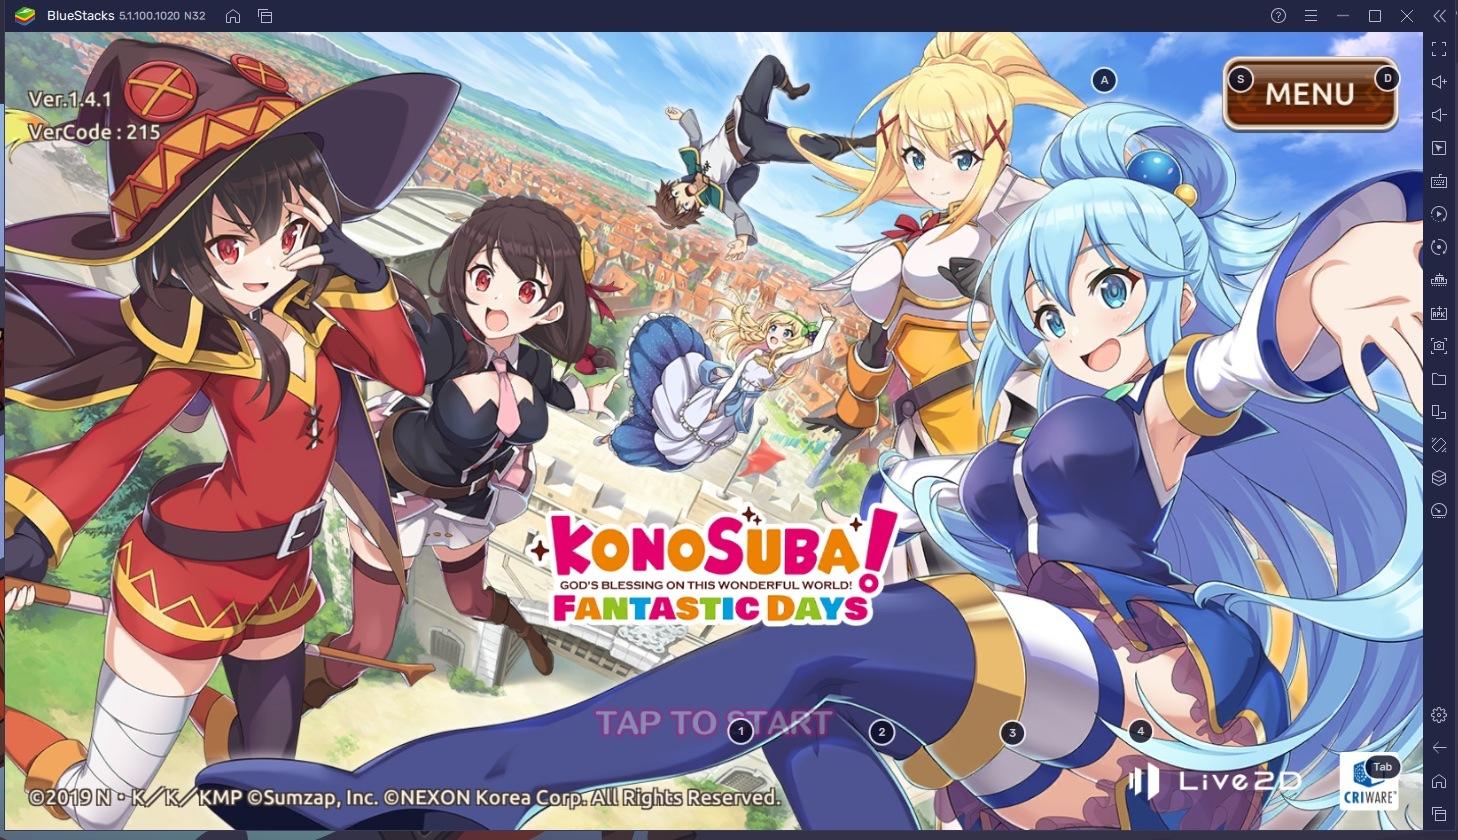 Cara Bermain KonoSuba: Fantastic Days via BlueStacks di PC!